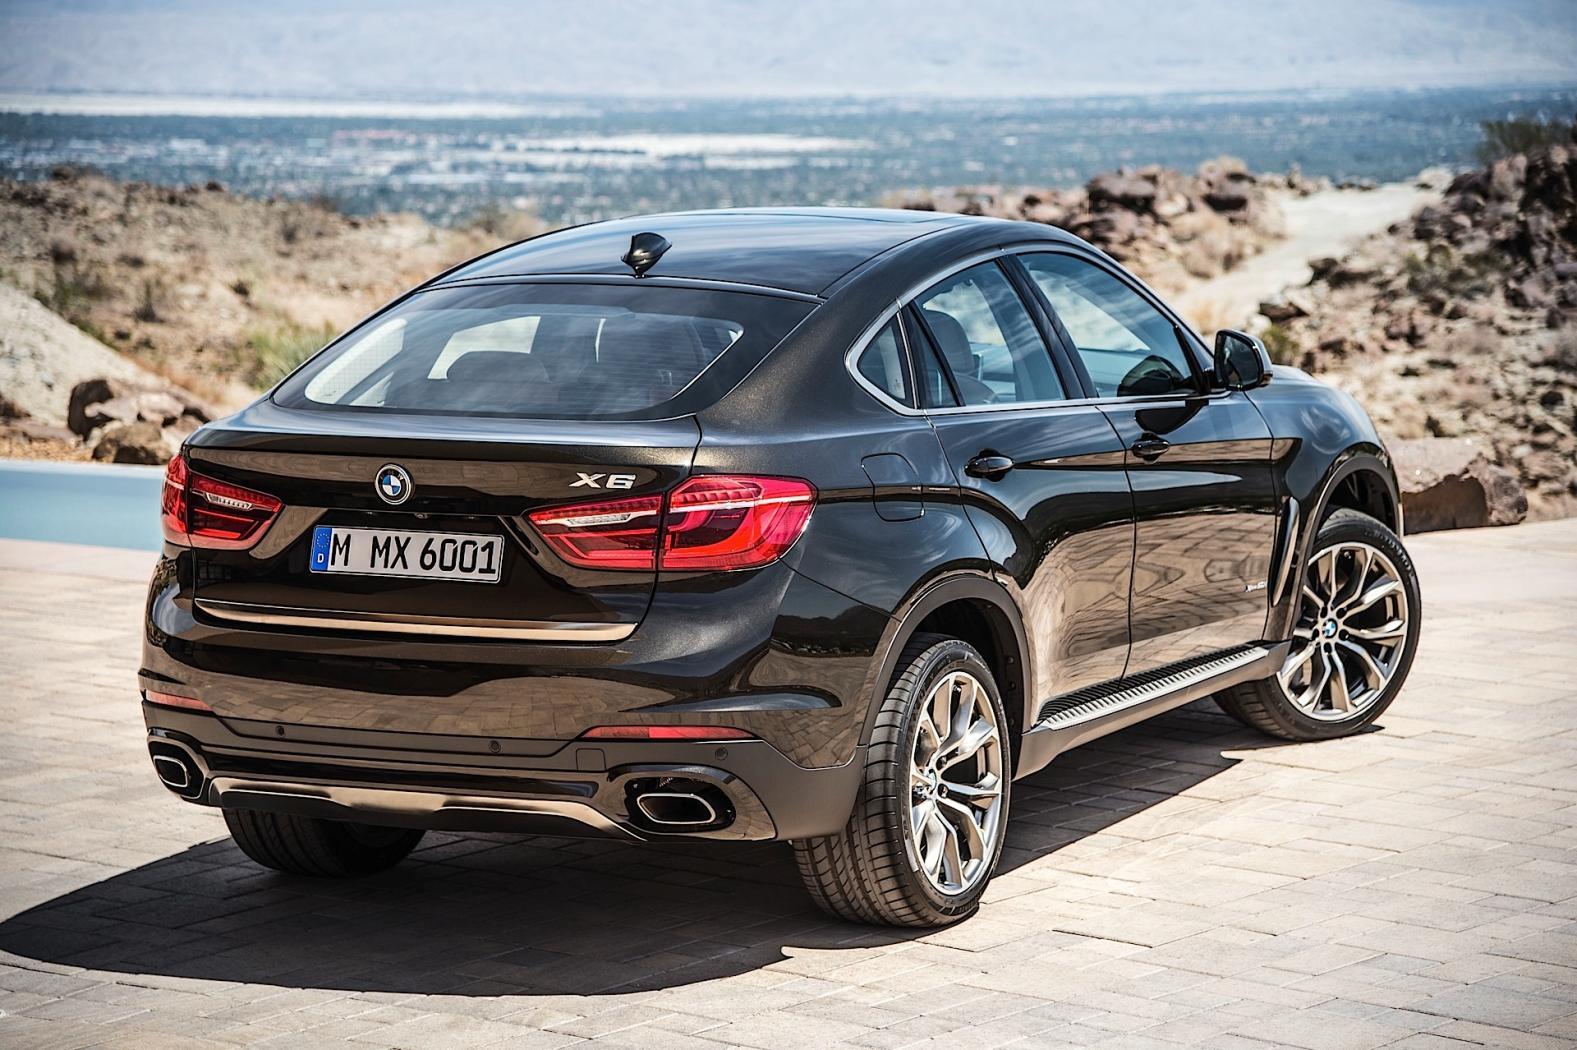 Fiche-occasion-BMW-X6-F16-7.jpeg